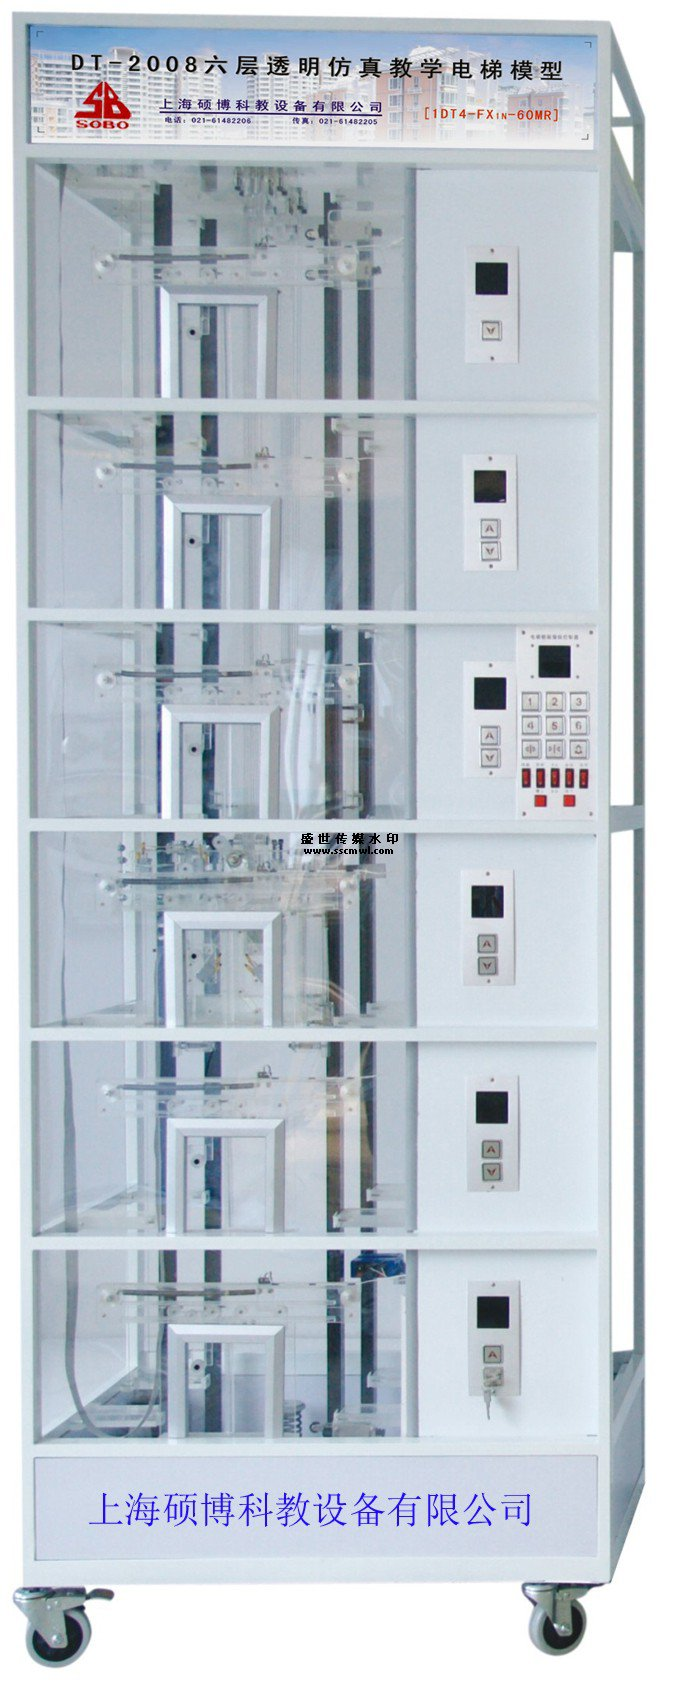 DT-2008六层透明仿真教学电梯模型 (三菱主机:1DT6-FX3U-64MR/西门子主机:1DT6-CPU226-EM223) 透明教学电梯模型是为了配合各大院校、职业技术学院、技师学院、技校、劳动就业培训中心、质量技术监督局特检中心、电梯维修物业管理部门等有关电梯专业和工业自动化专业课程实验演示,使更多的人能够更好地了解电梯、使用电梯,培养出更多的电梯专业人才,适应电梯行业的发展需要,我公司经过深入探索研究,精心设计的。 本电梯是根据最常见的升降式电梯结构,采用钢管焊接一体而成,表面经过磷化喷塑处理